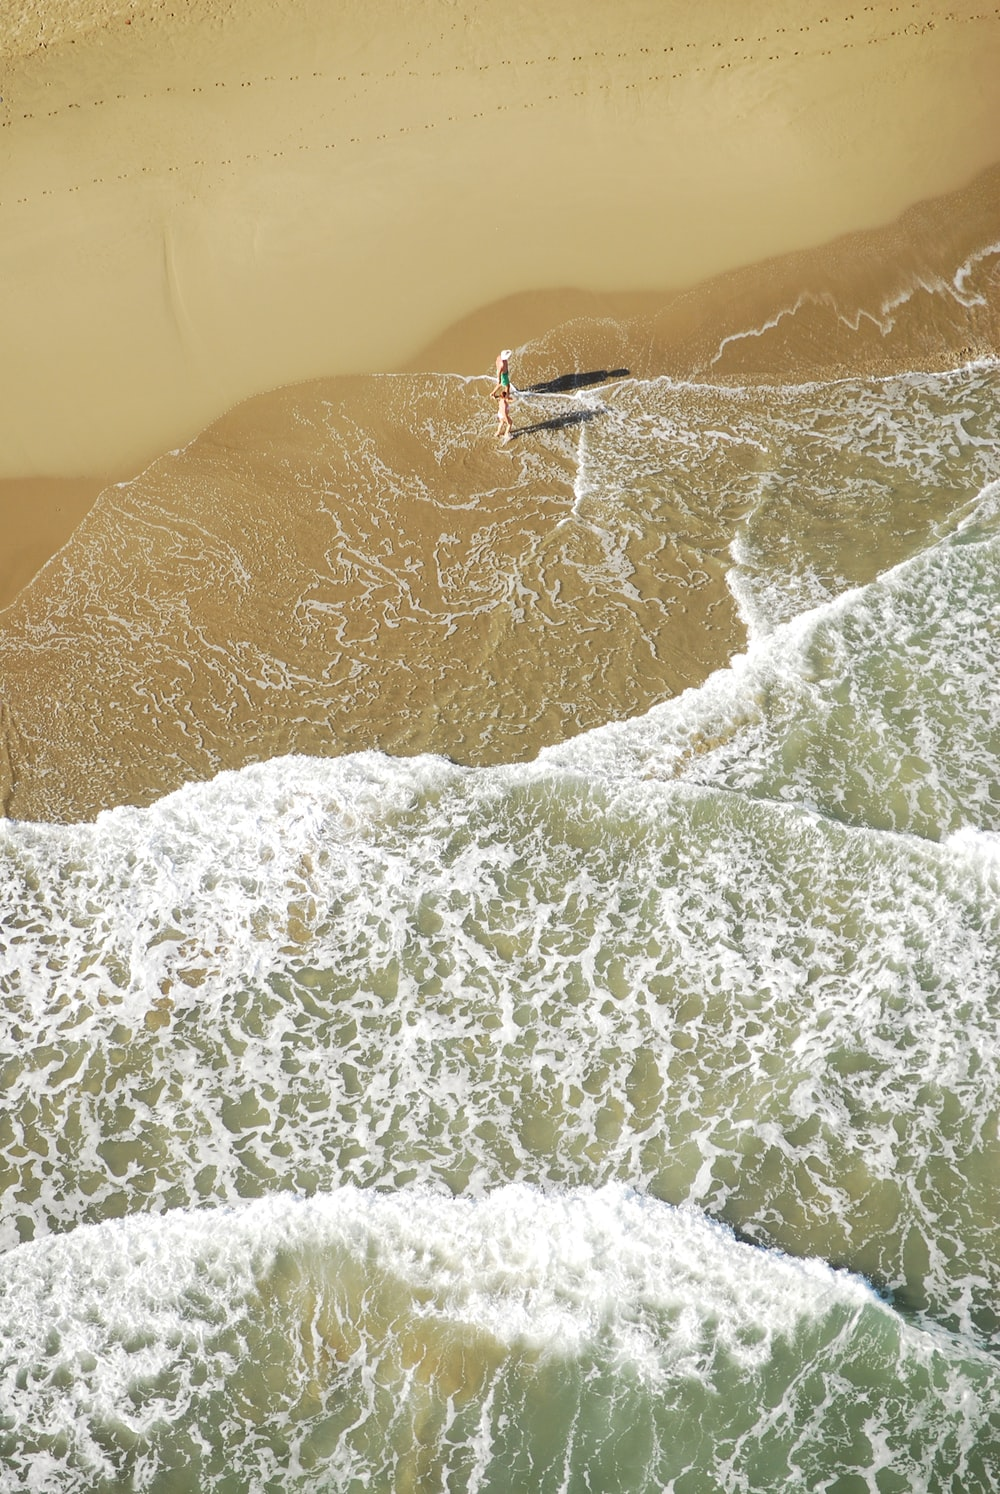 person walking on seashore waves